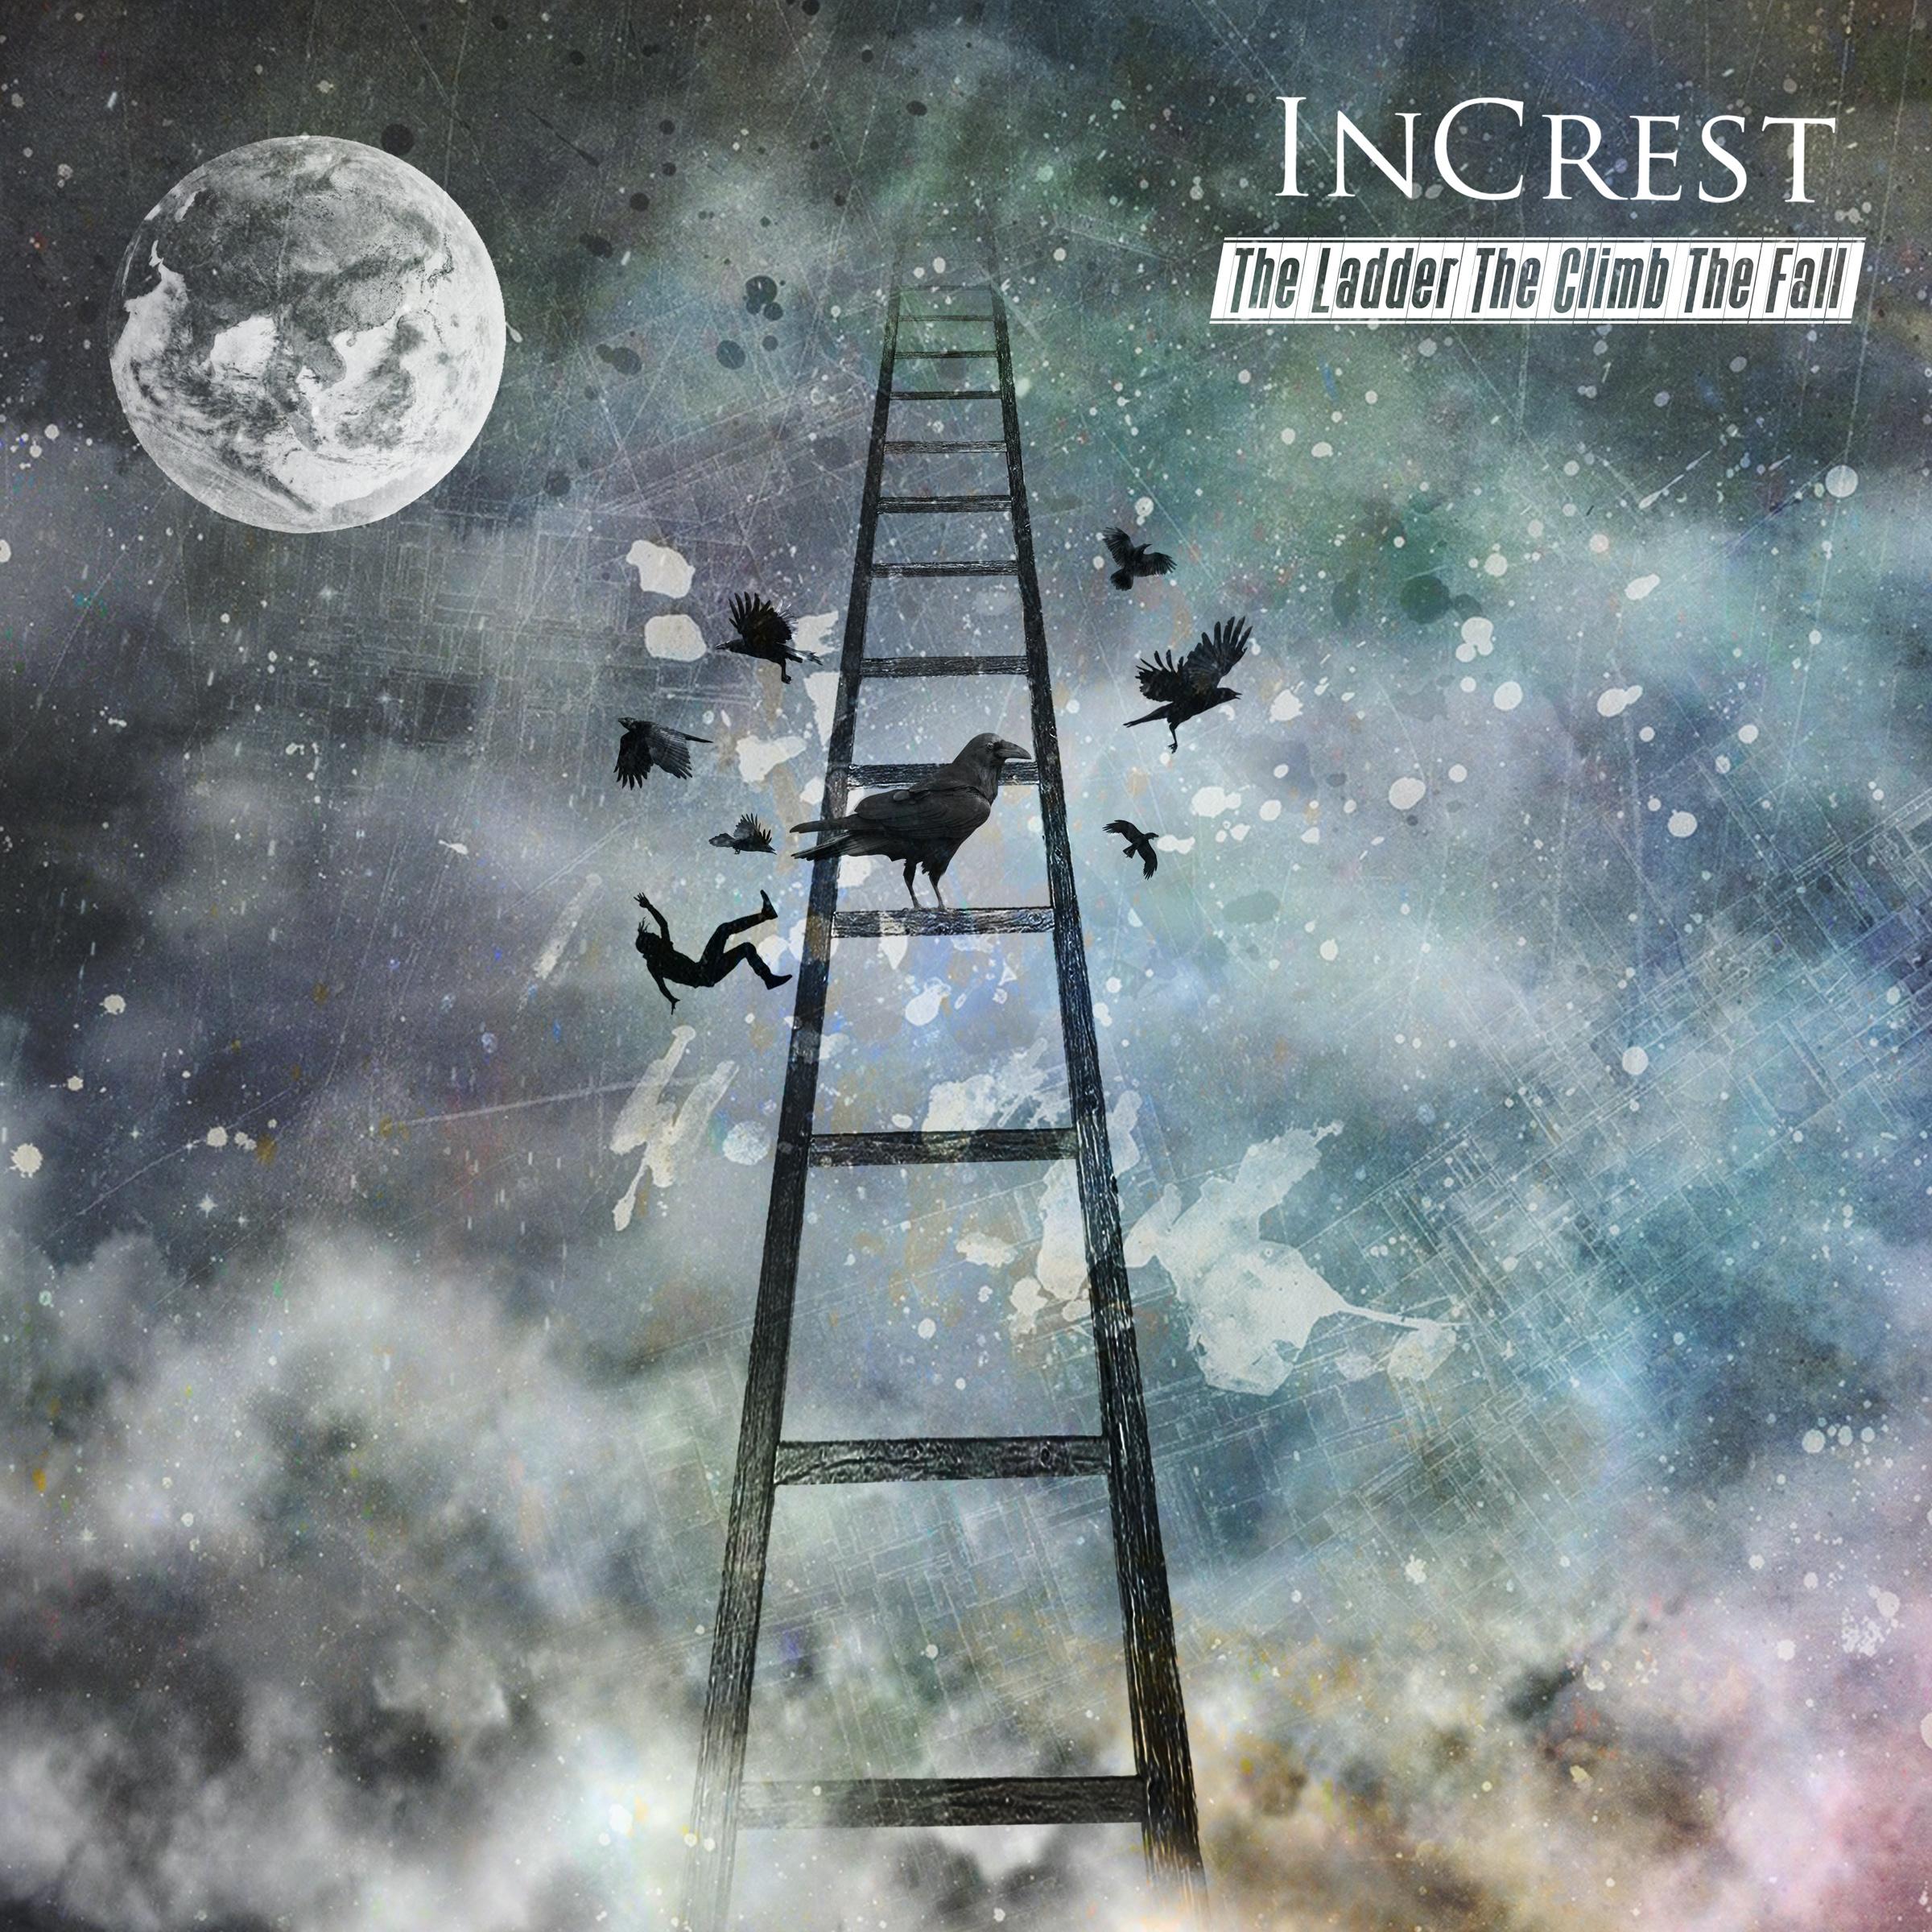 InCrest - LCF - Cover Art (2400x2400).jpg